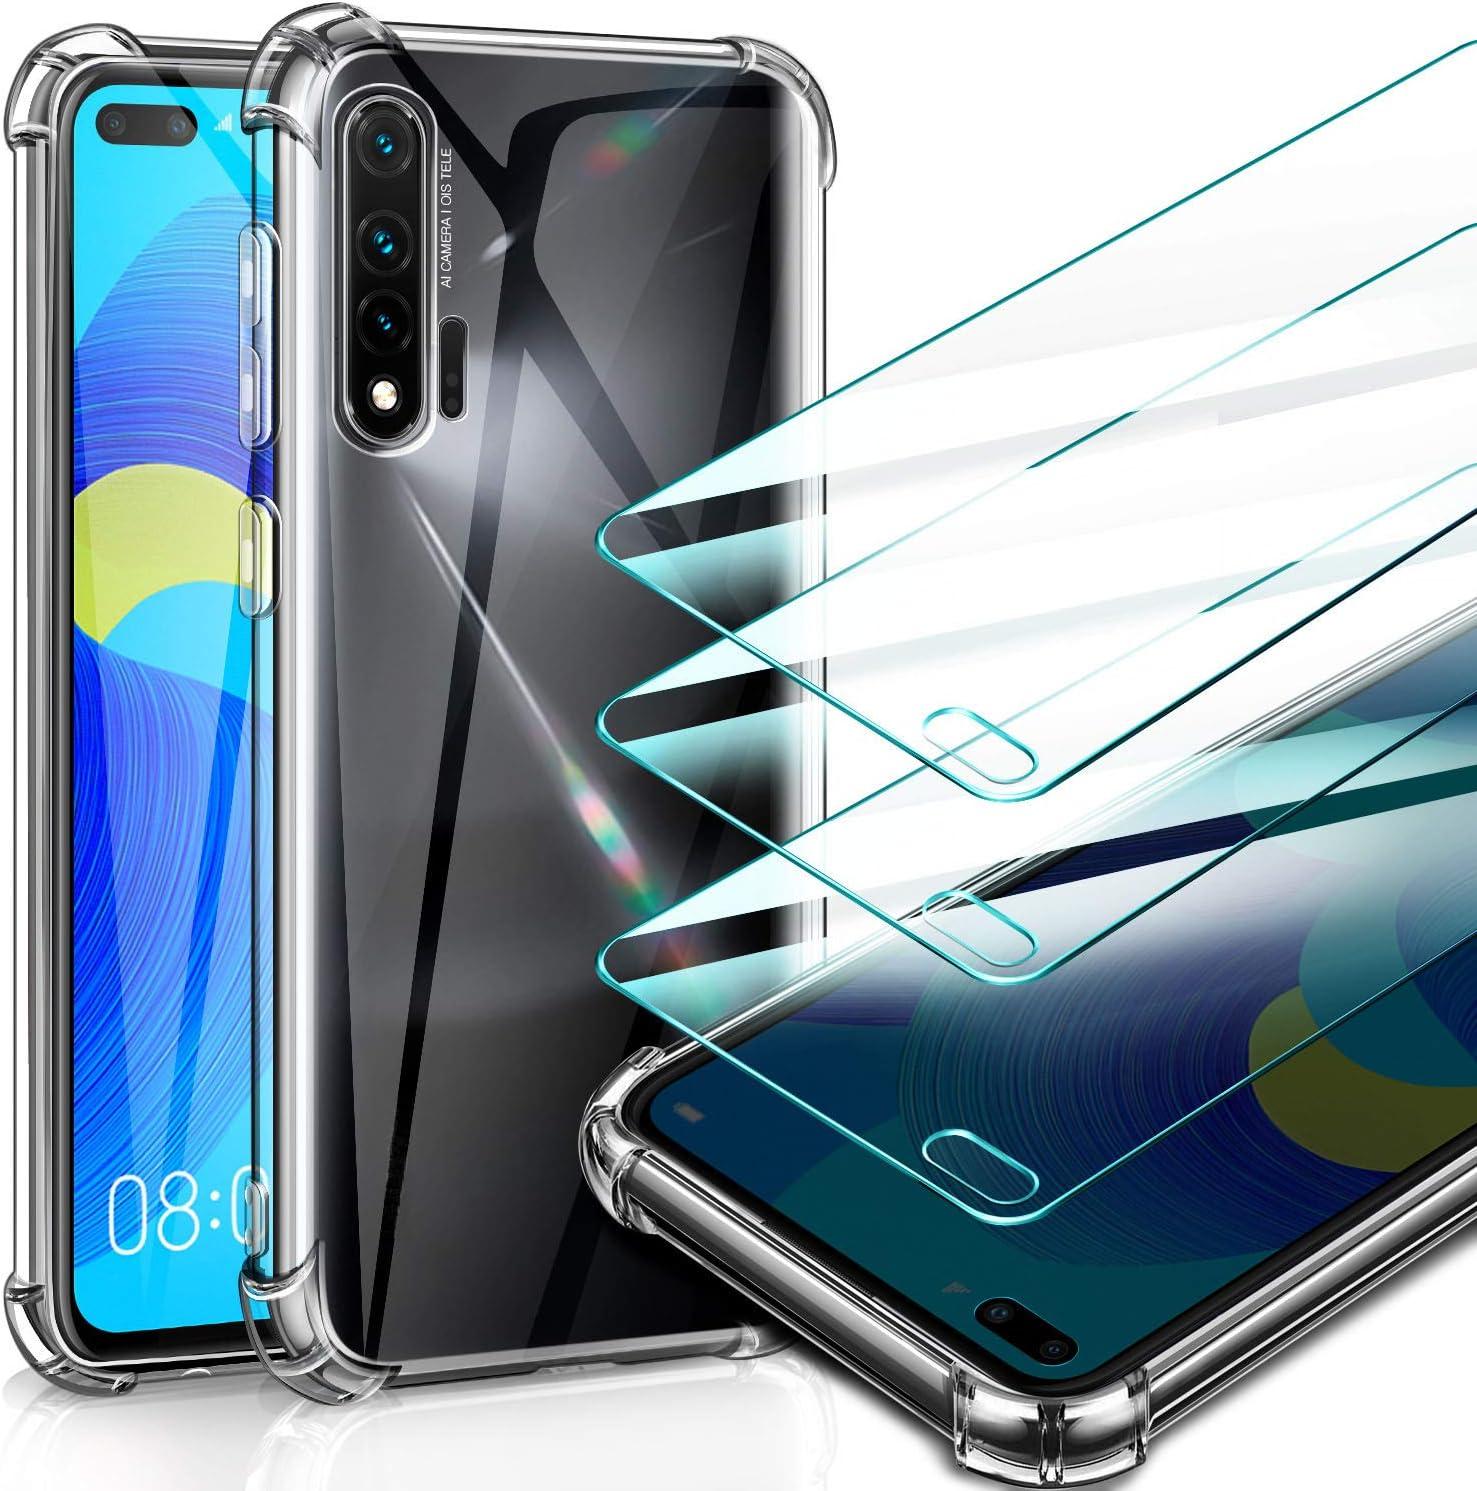 3 Pack Leathlux Samsung Galaxy A01 Case + Tempered Glass Screen Protector Ultra Thin Silicone Transparent TPU Case Airbag Anti-Shock Anti-scratch Cover Samsung Galaxy A01